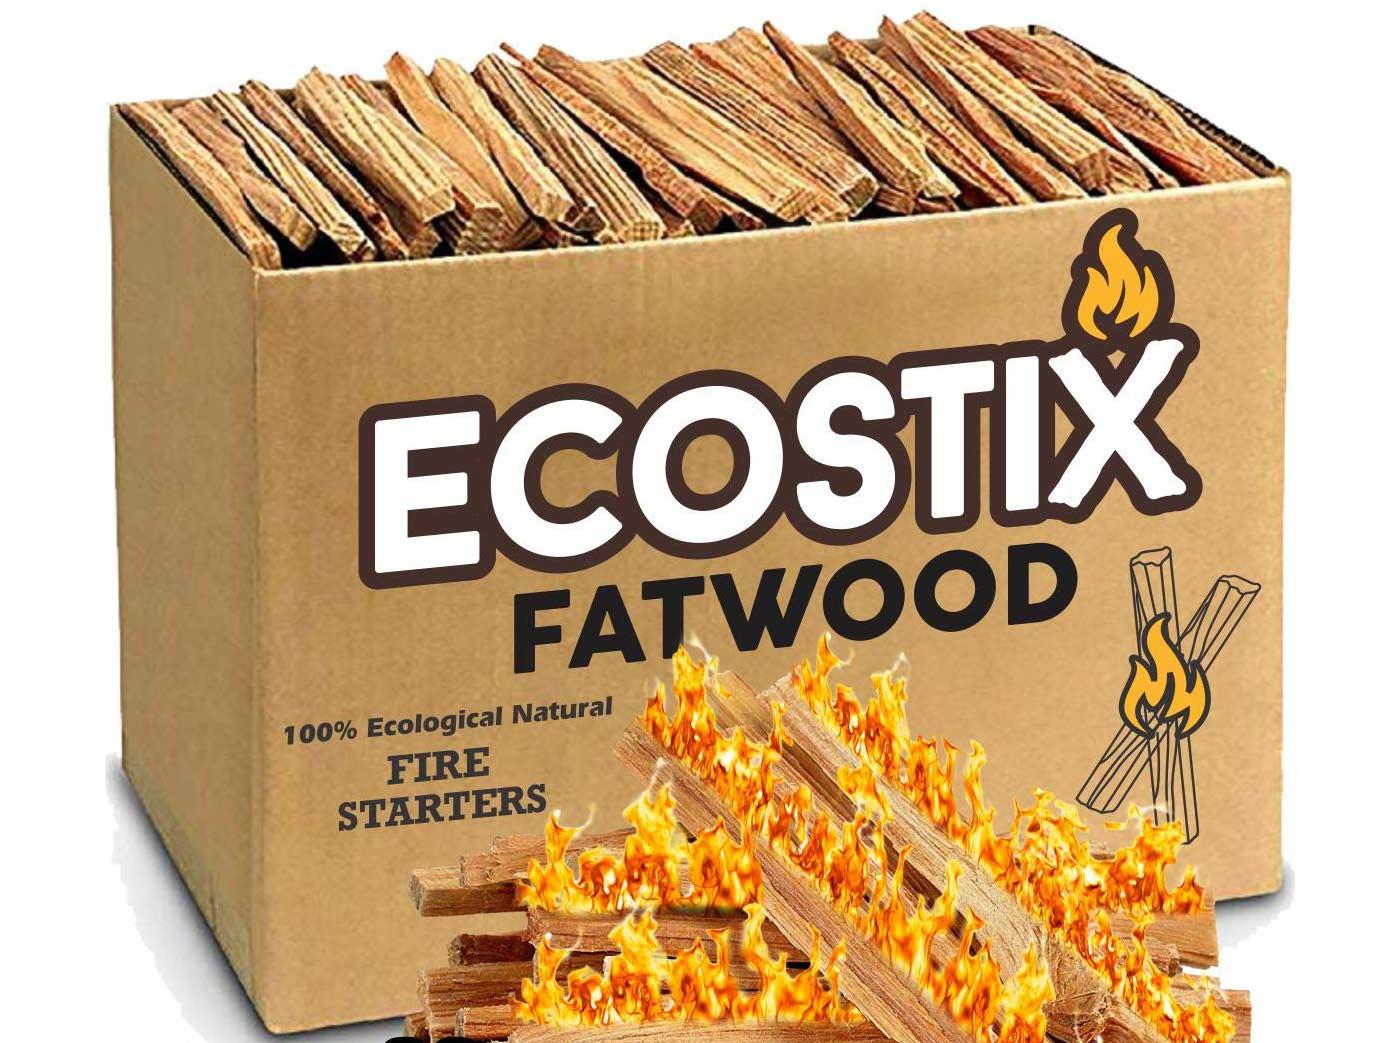 Eco-Stix Fatwood Starter